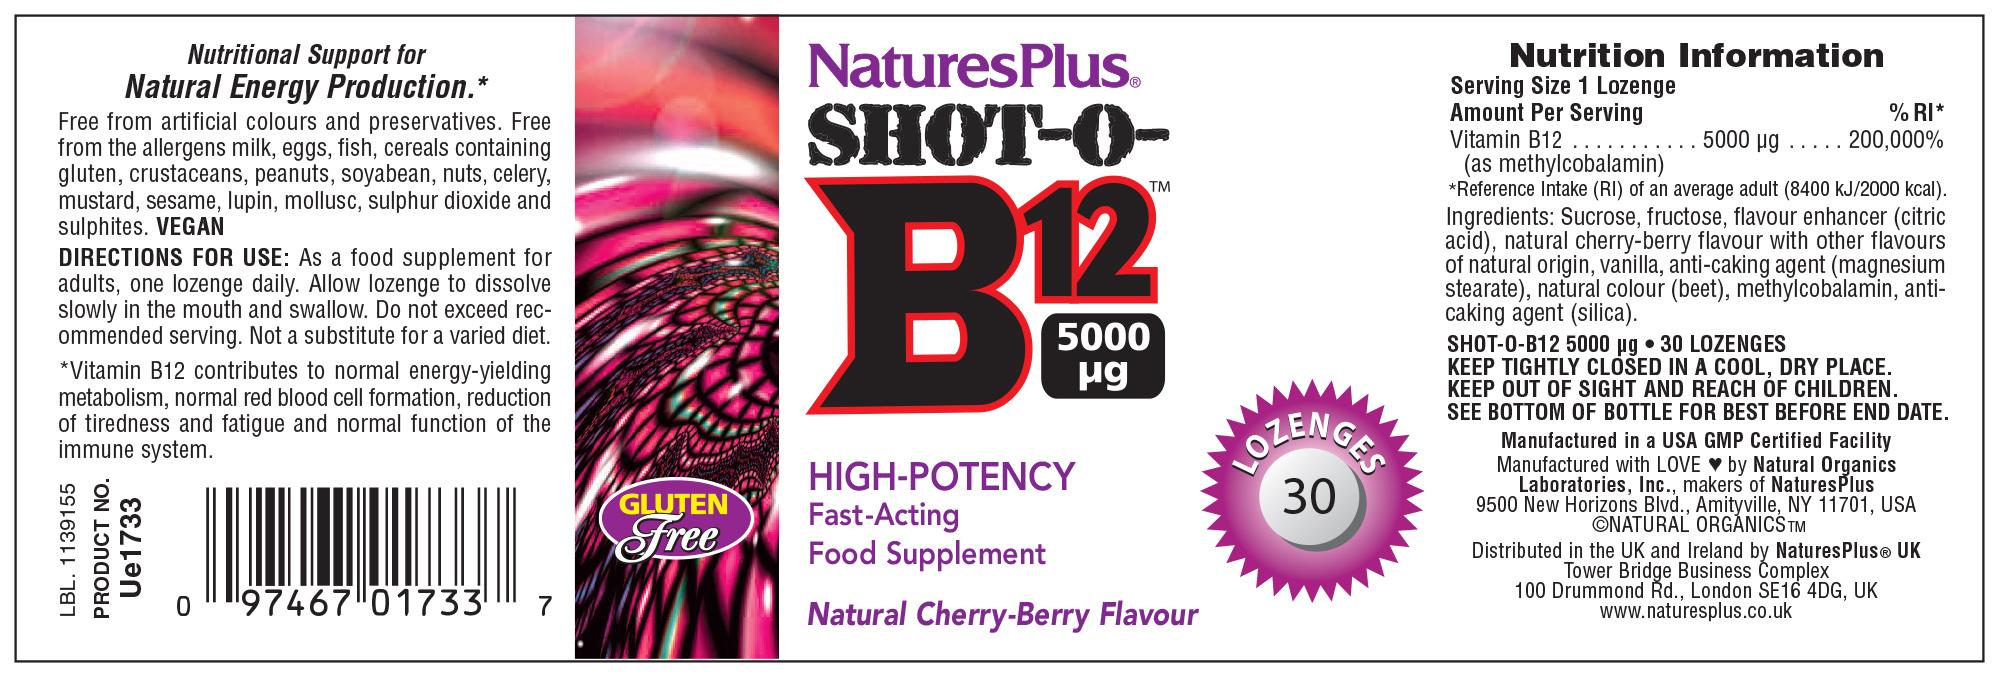 Shot-O-B12 30 Lozenges